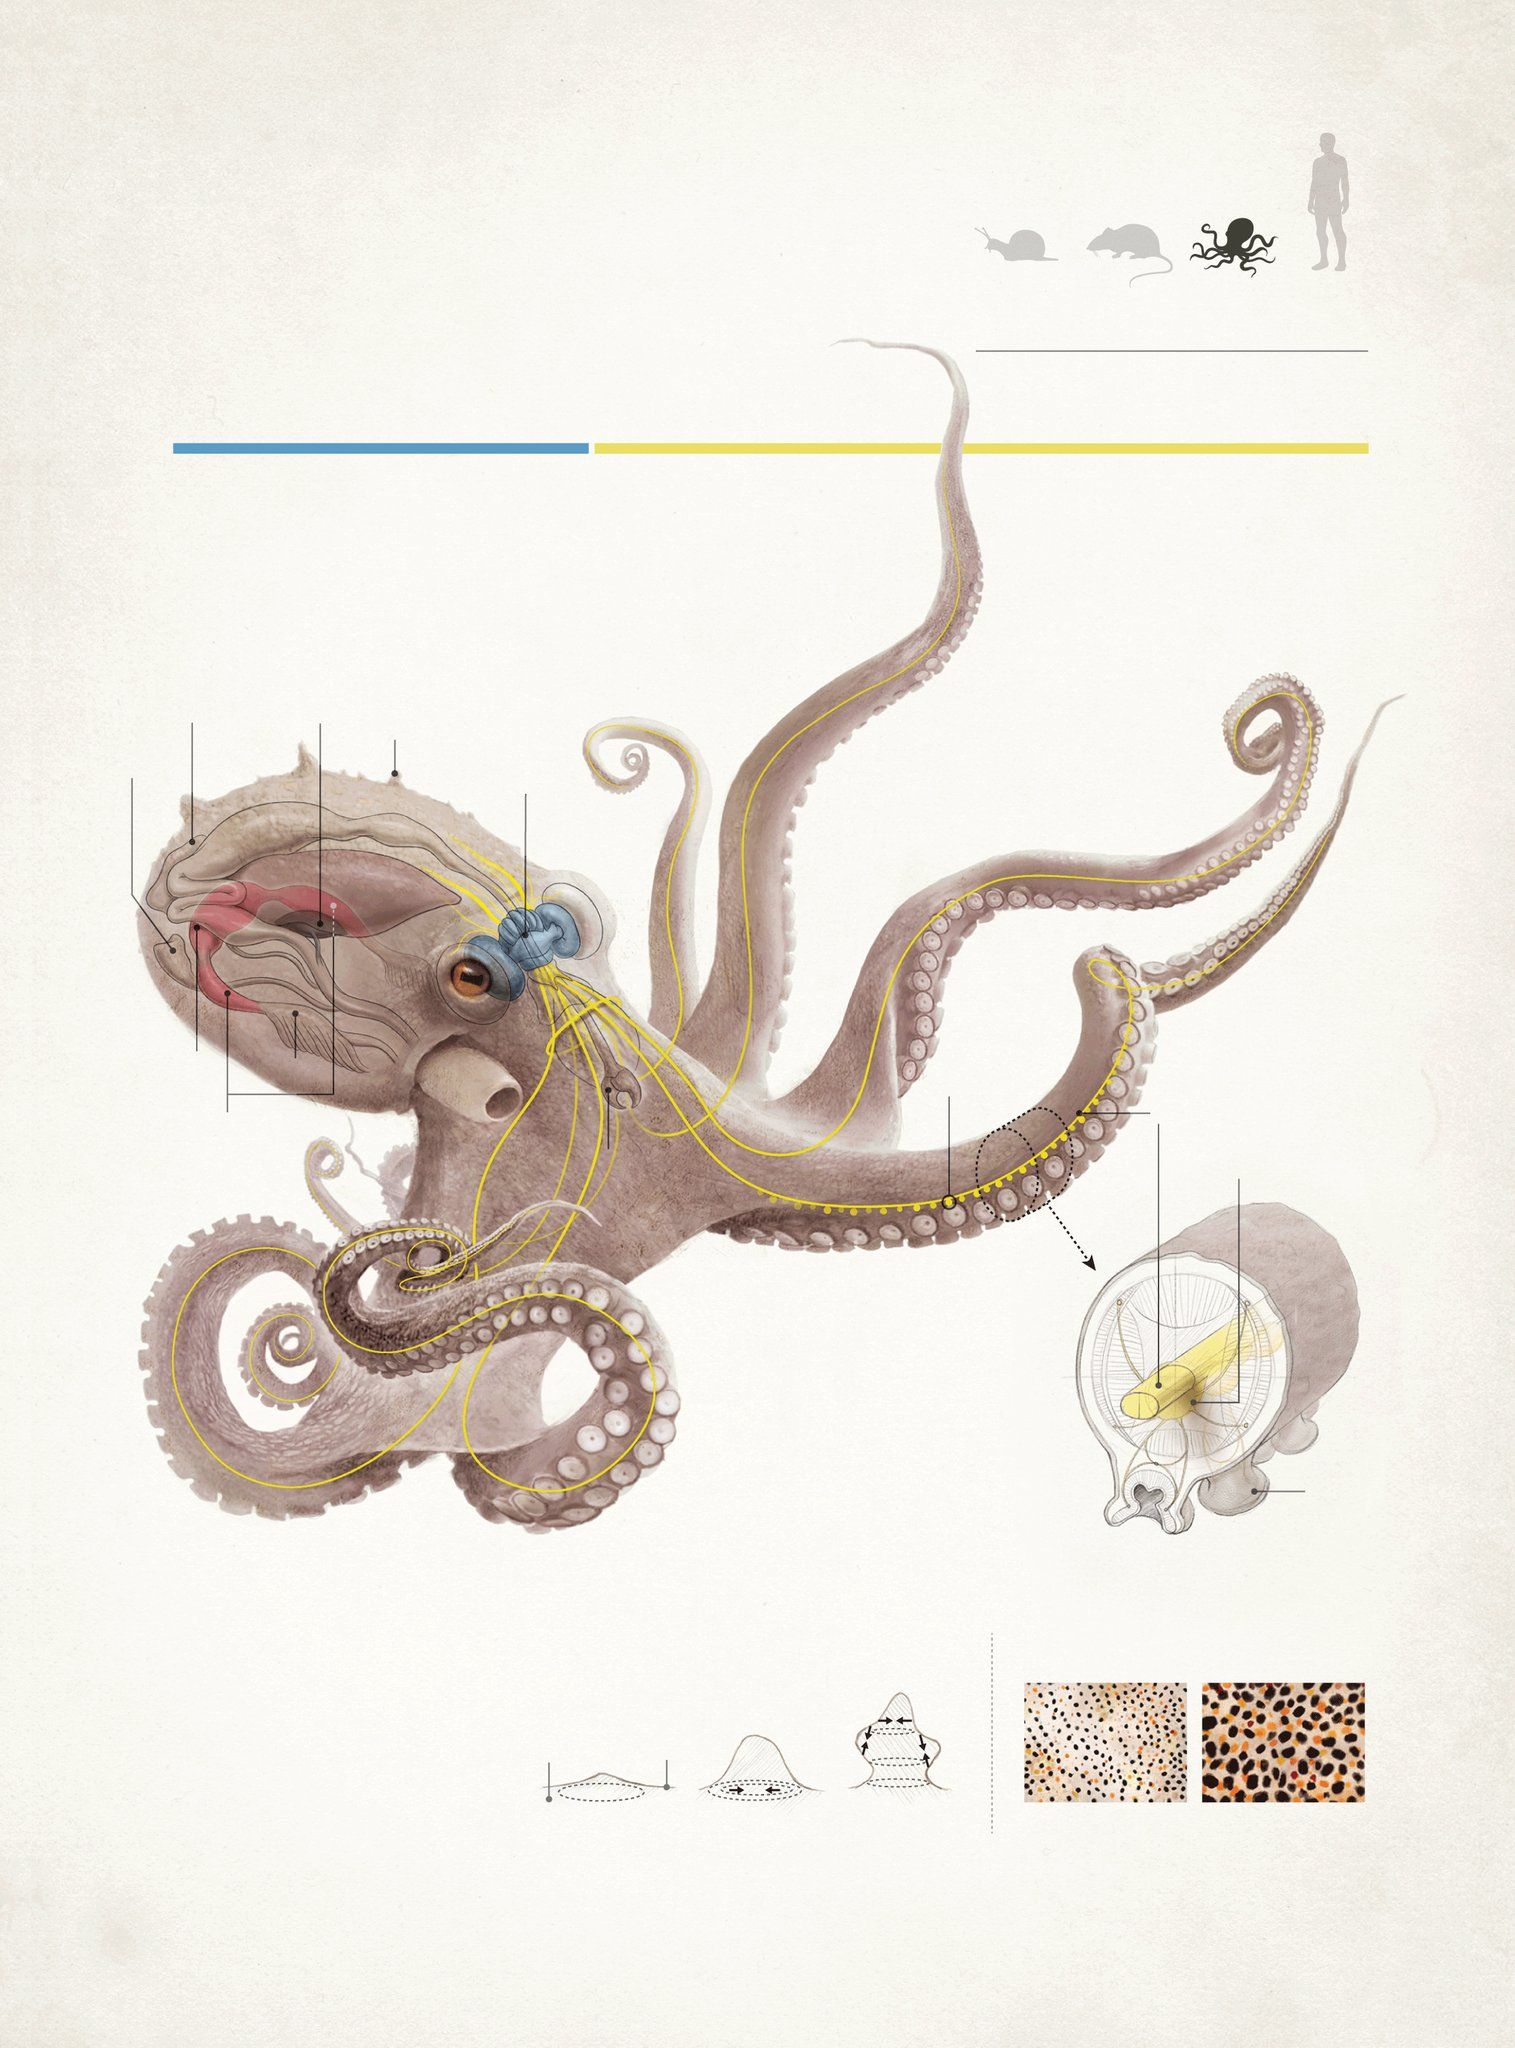 Marilyn Terrell on | SciViz | Pinterest | Anatomy